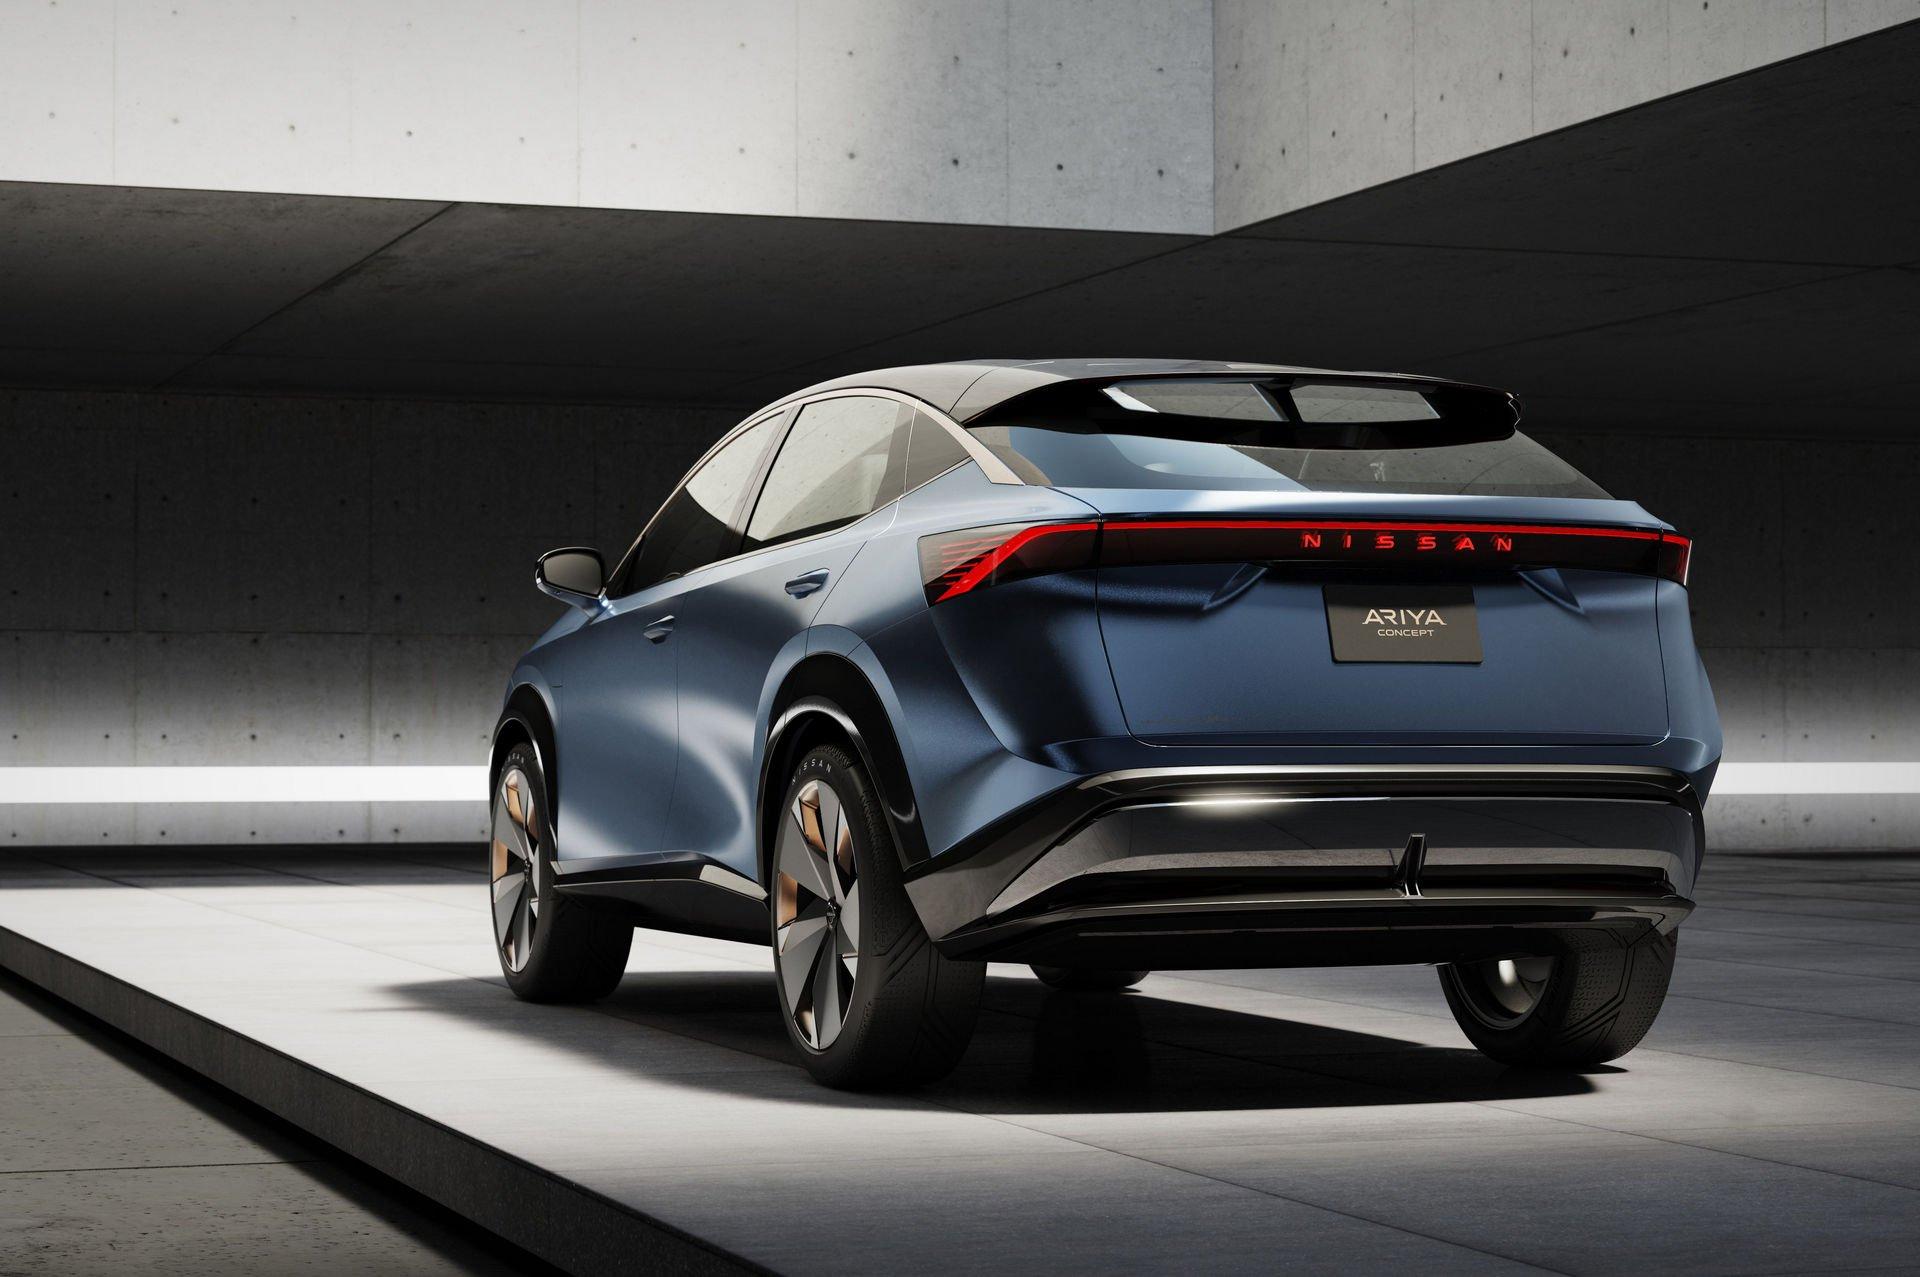 Nissan-Ariya-Concept-15